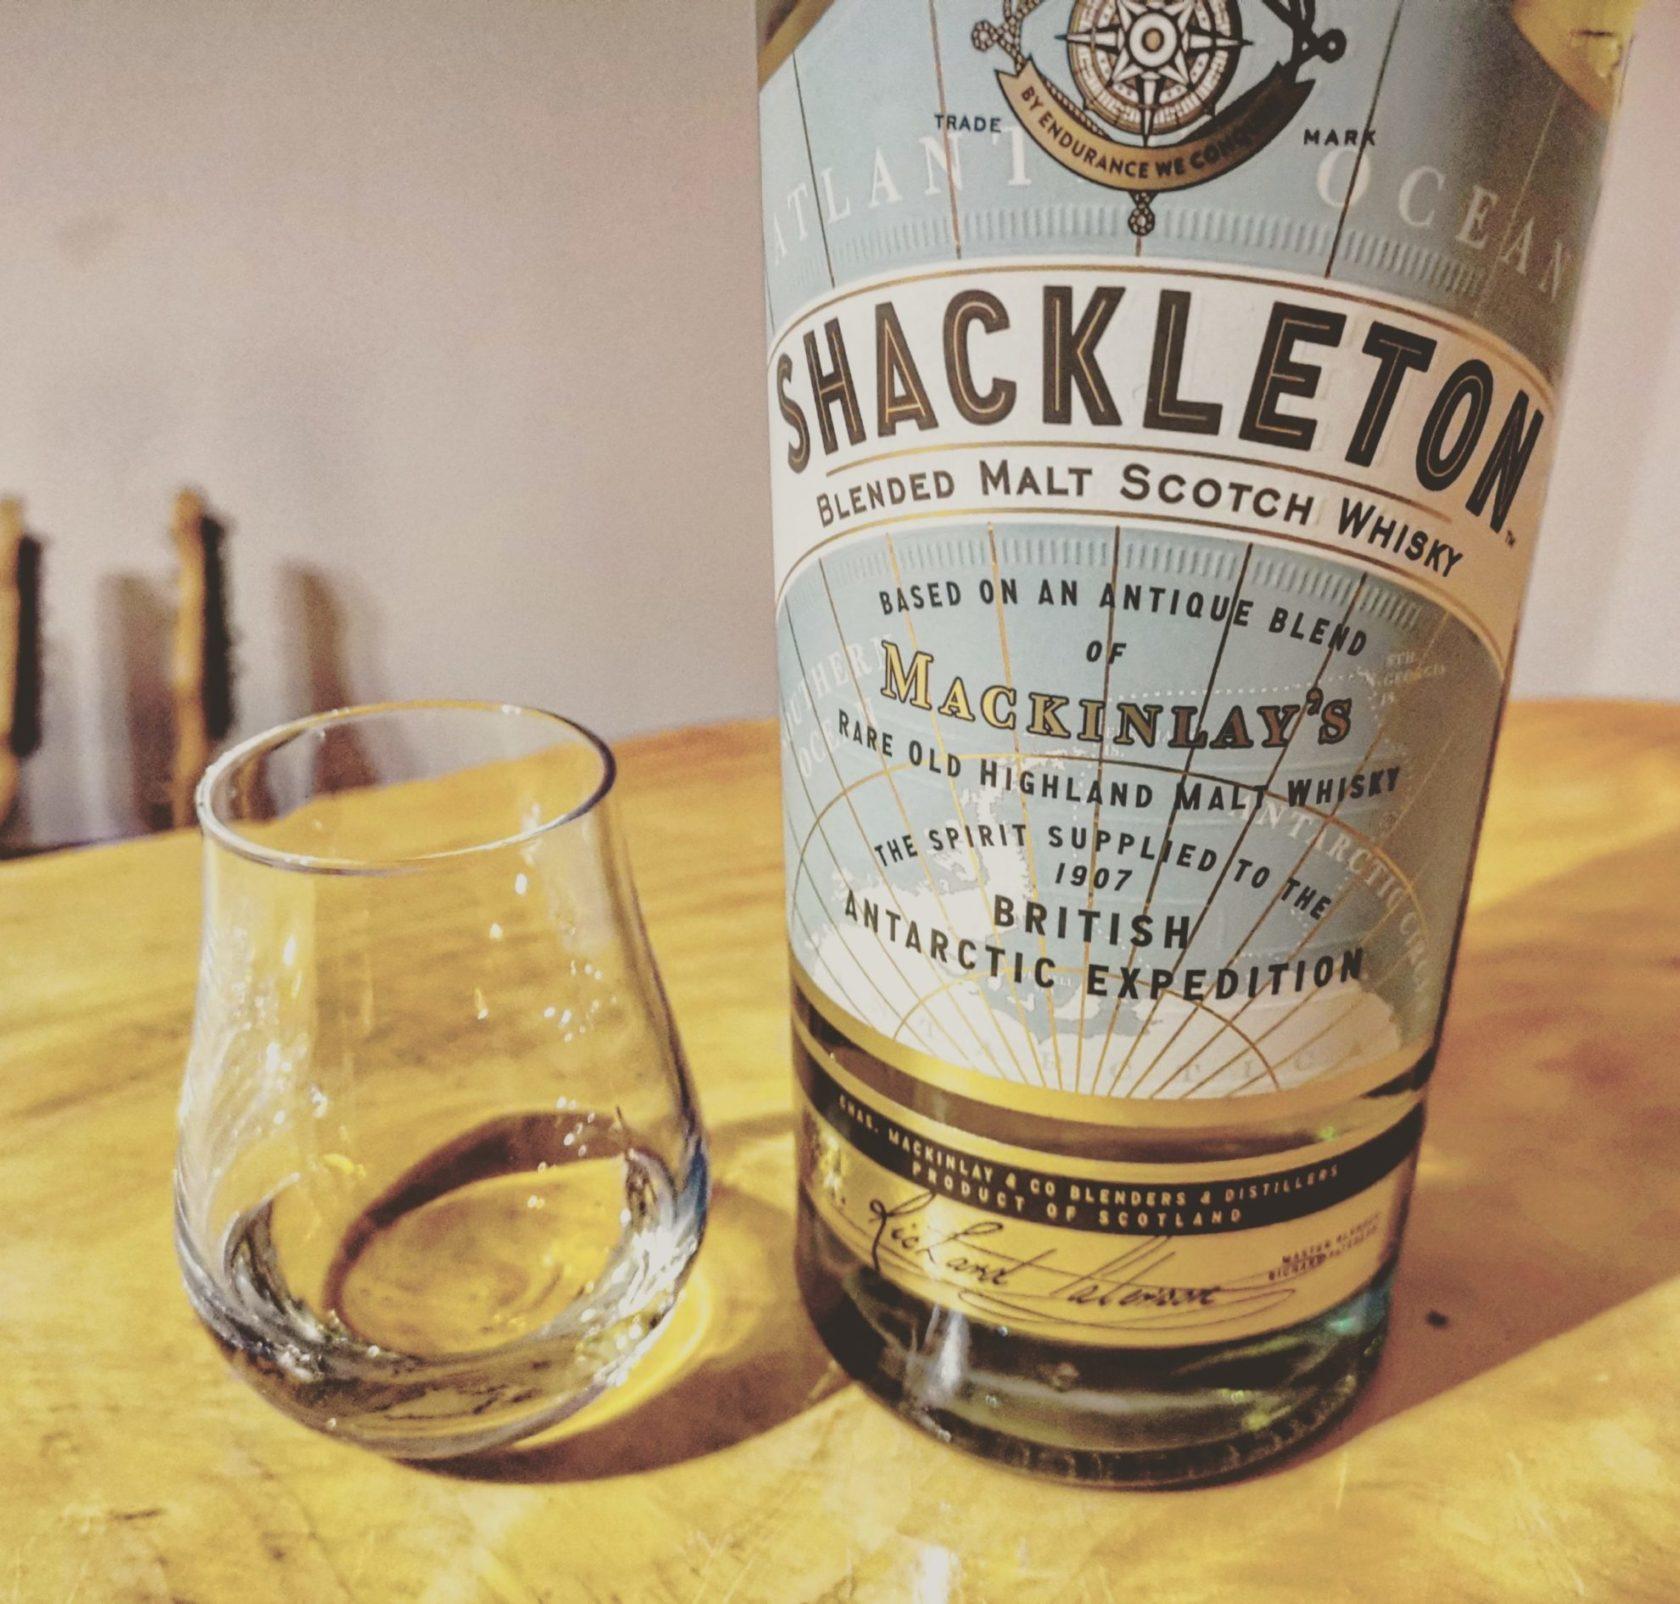 Shackleton Highland Blended Malt Scotch Whisky